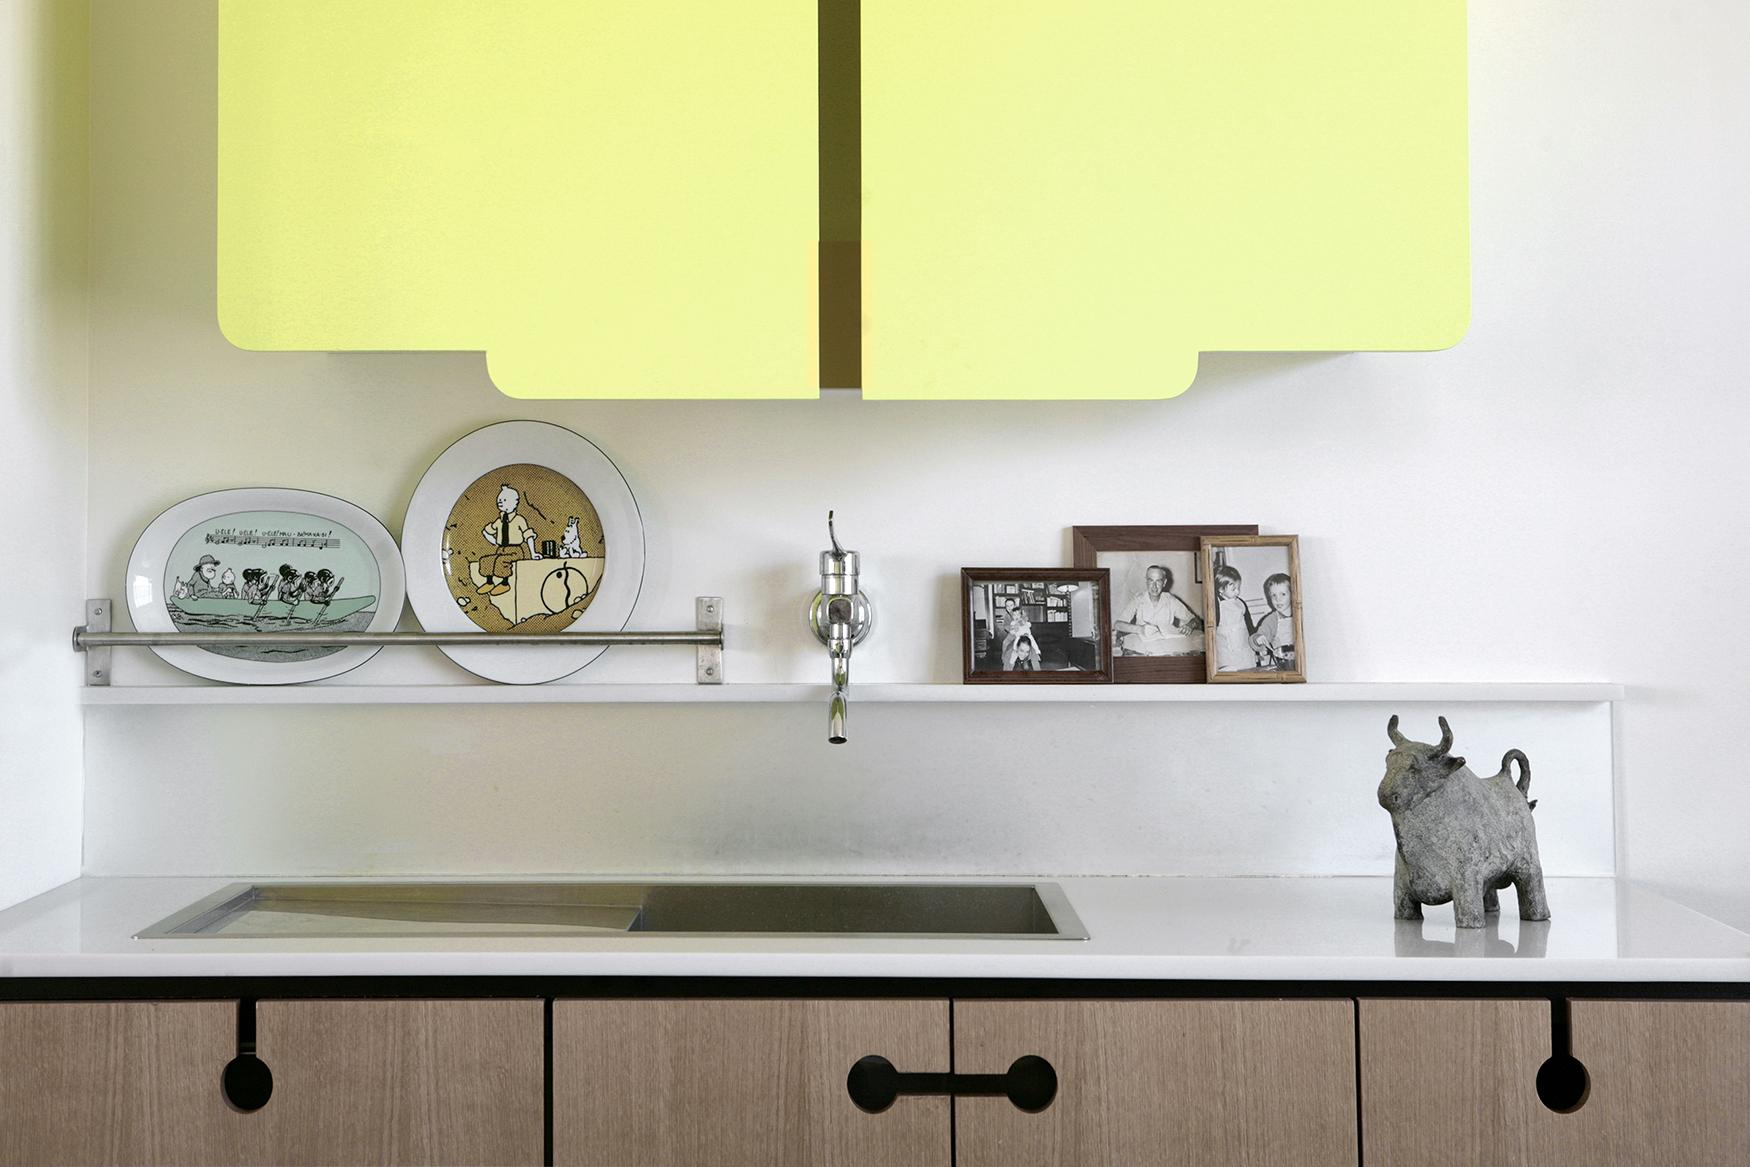 sandrine sarah faivre-architecture-interieure-living-2009-appartementGracieuse-08